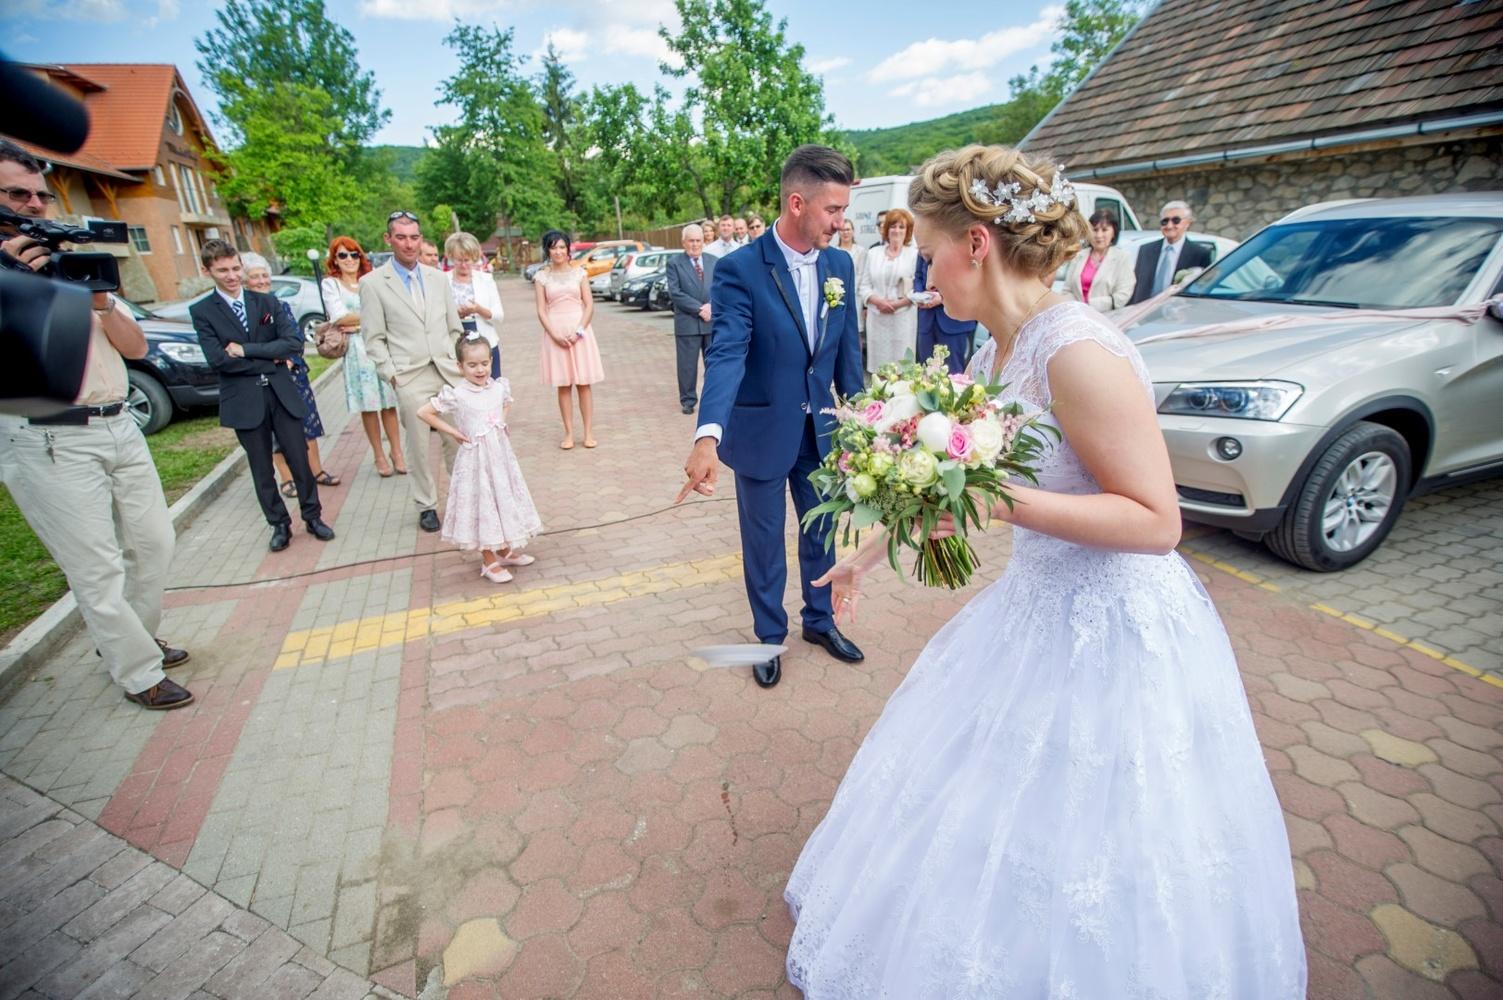 http://www.fotoz.sk/images/gallery-18/normal/eskuvo-fotozas_svadobne-fotenie_507.jpg